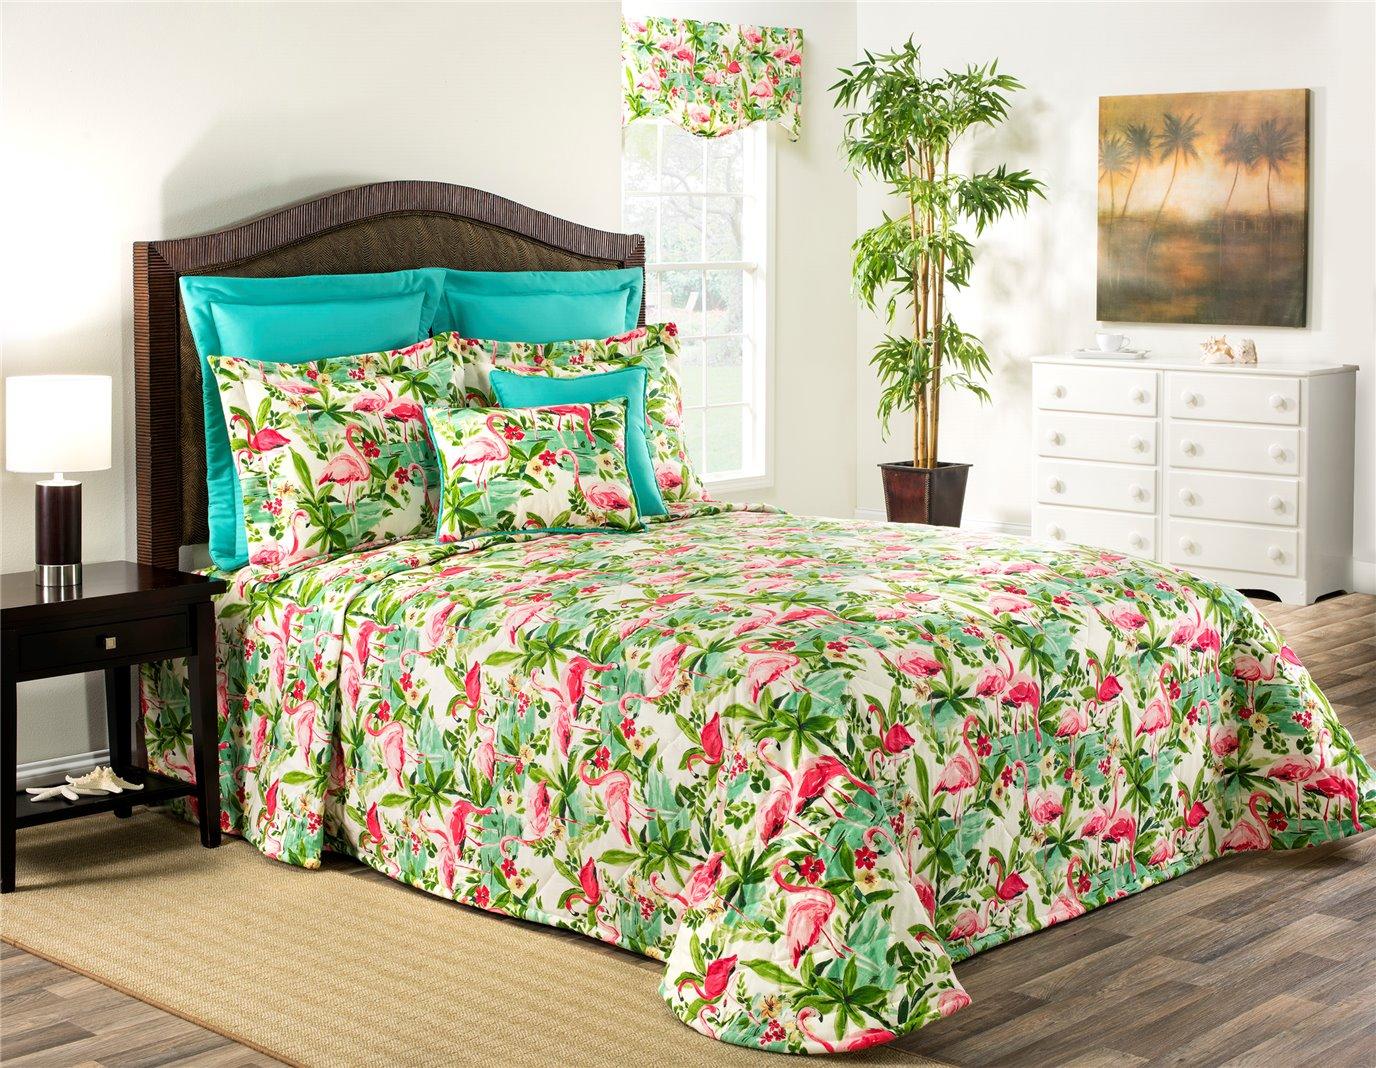 Floridian Flamingo Queen Bedspread